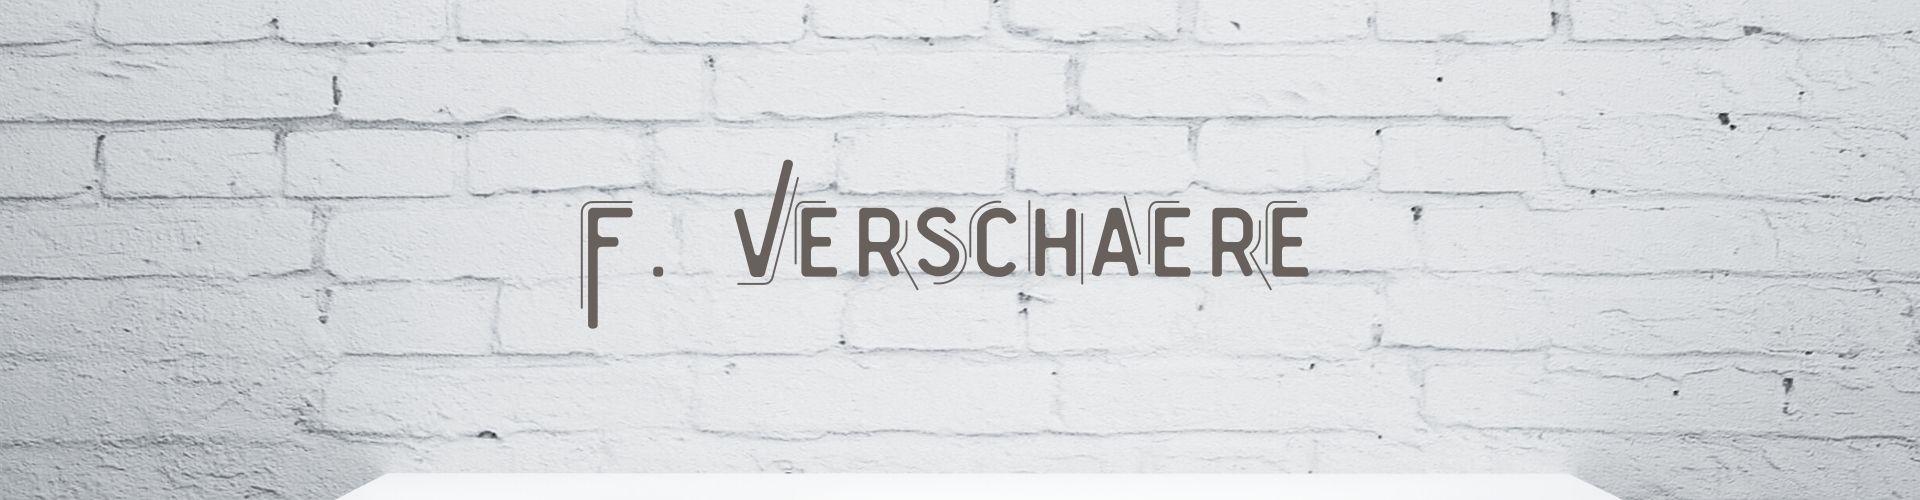 Fabien Verschaere : Art Contemporain à l'état pur et street Art